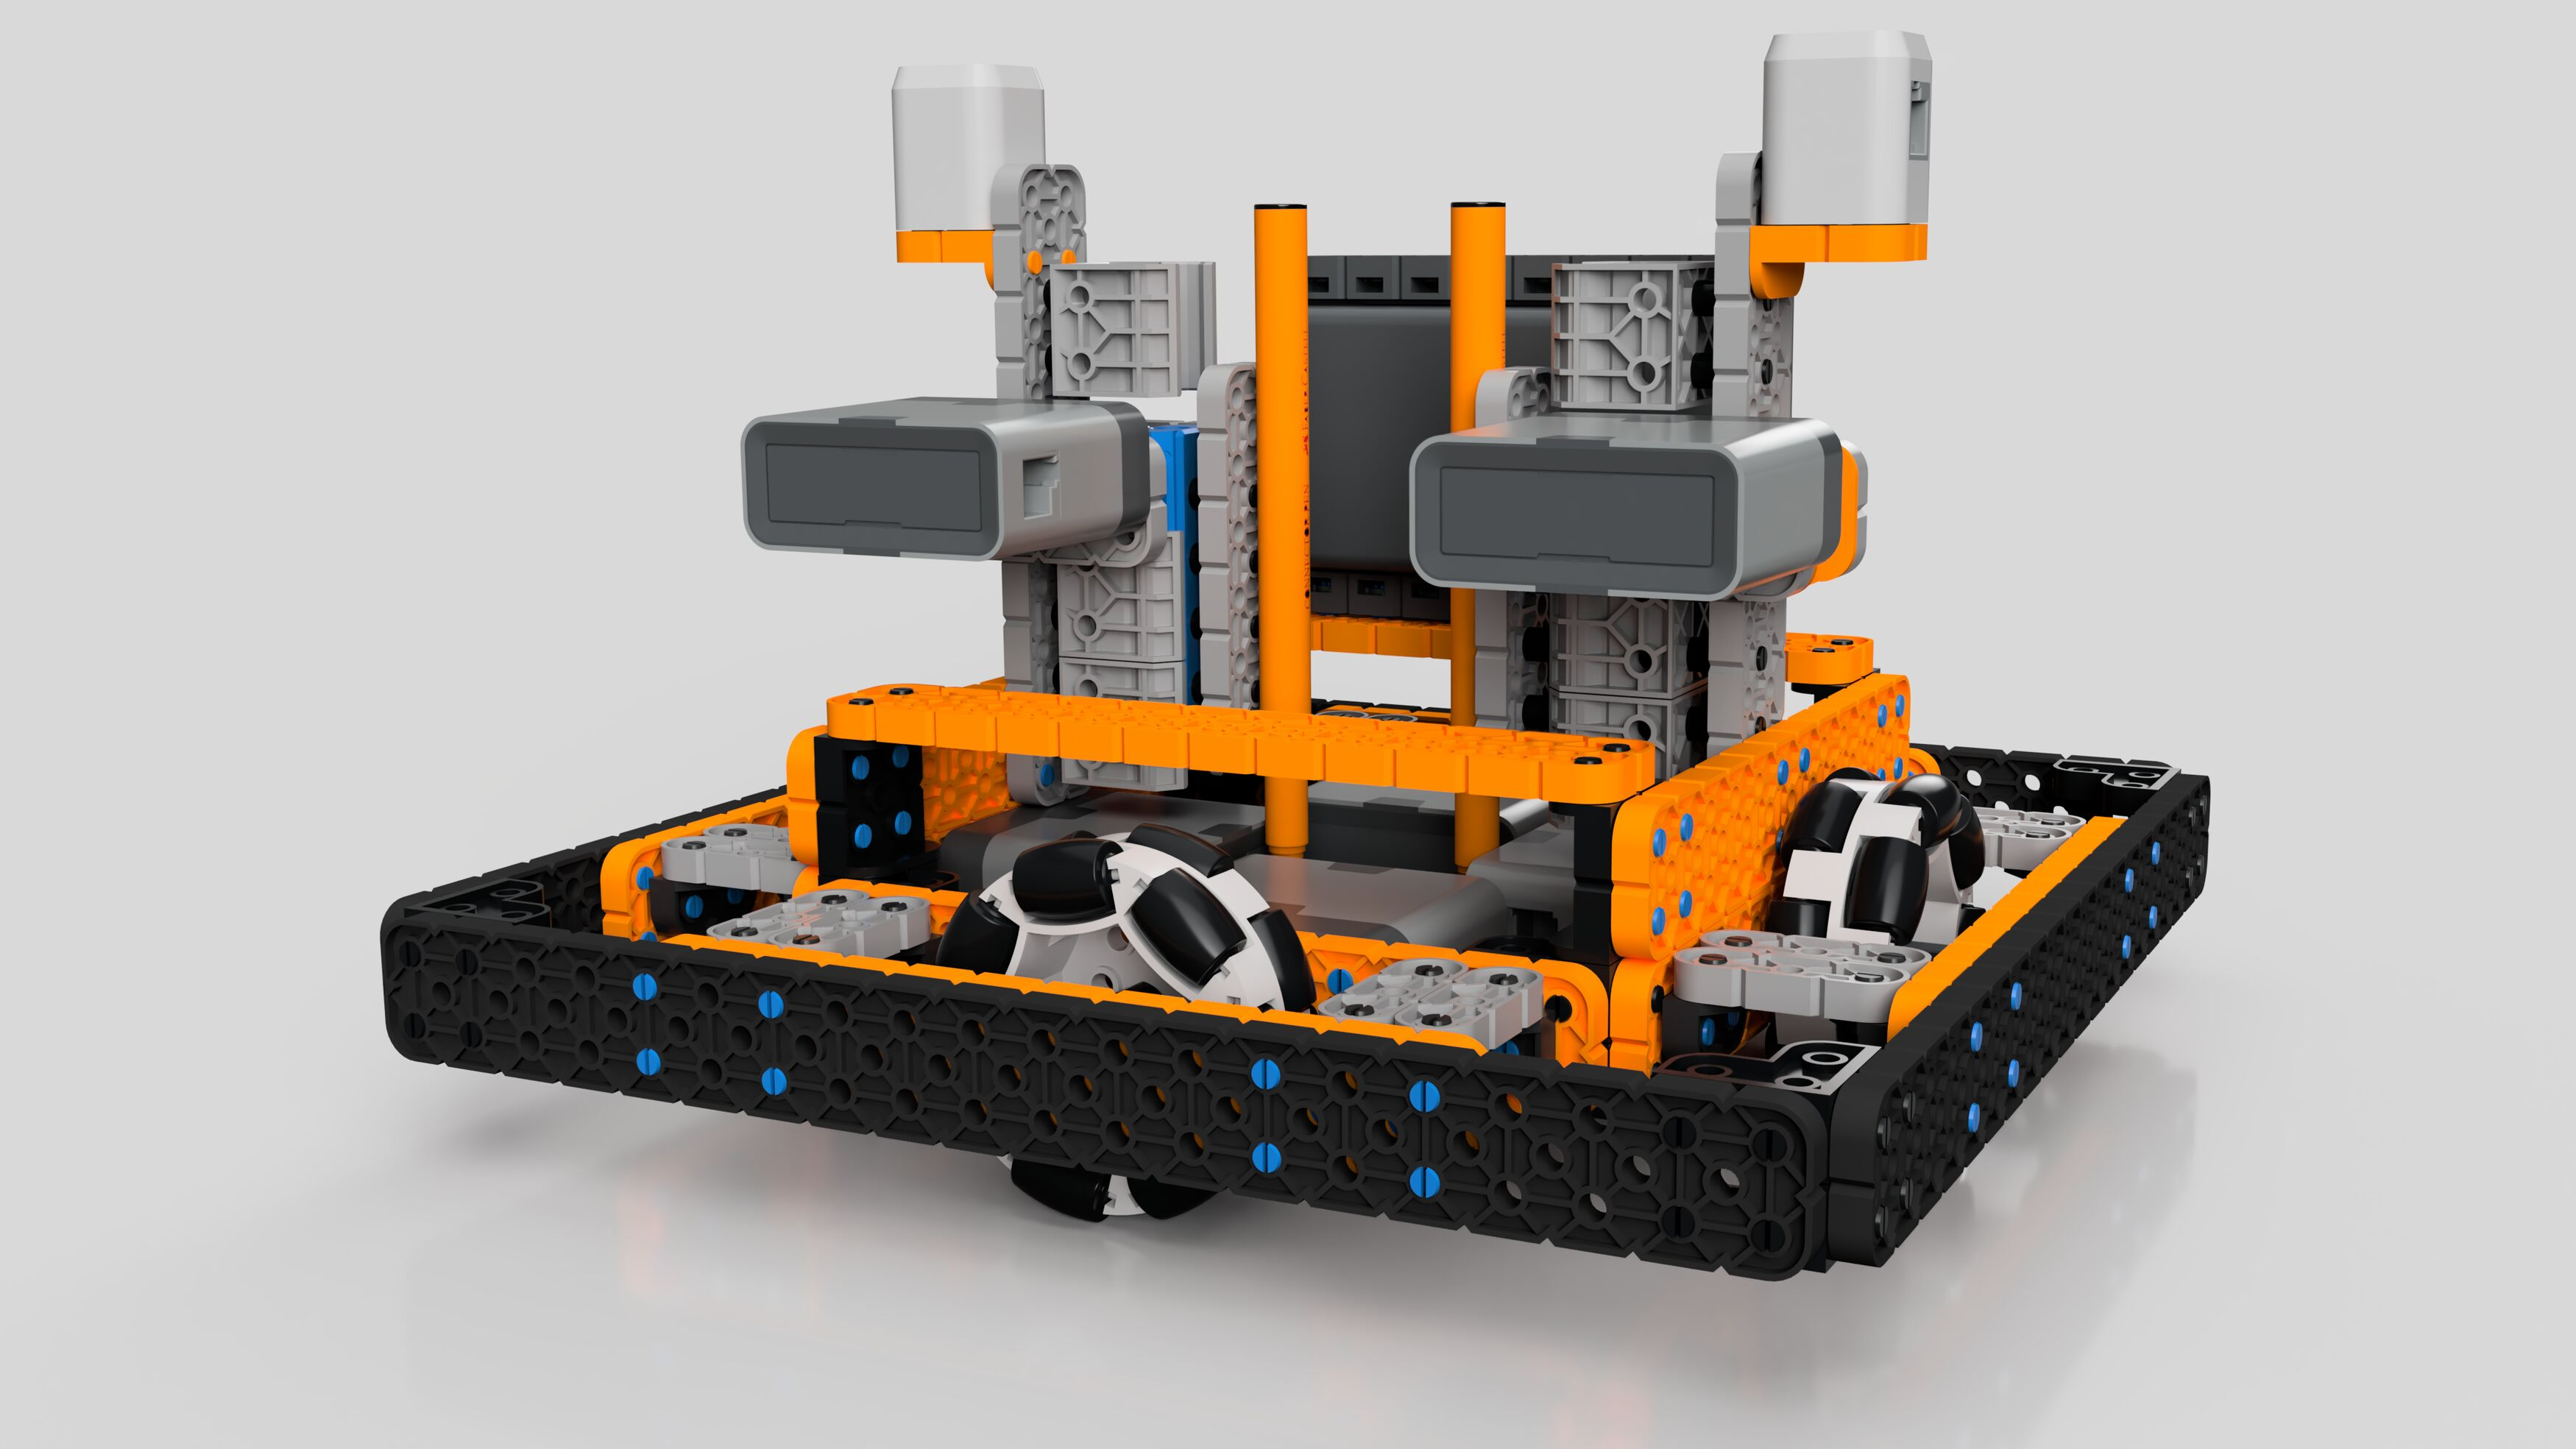 Robotics-pen-oficial-2-cores---fabrica-de-nerdes-2020-may-28-08-03-00pm-000-customizedview2296502511-png-3500-3500